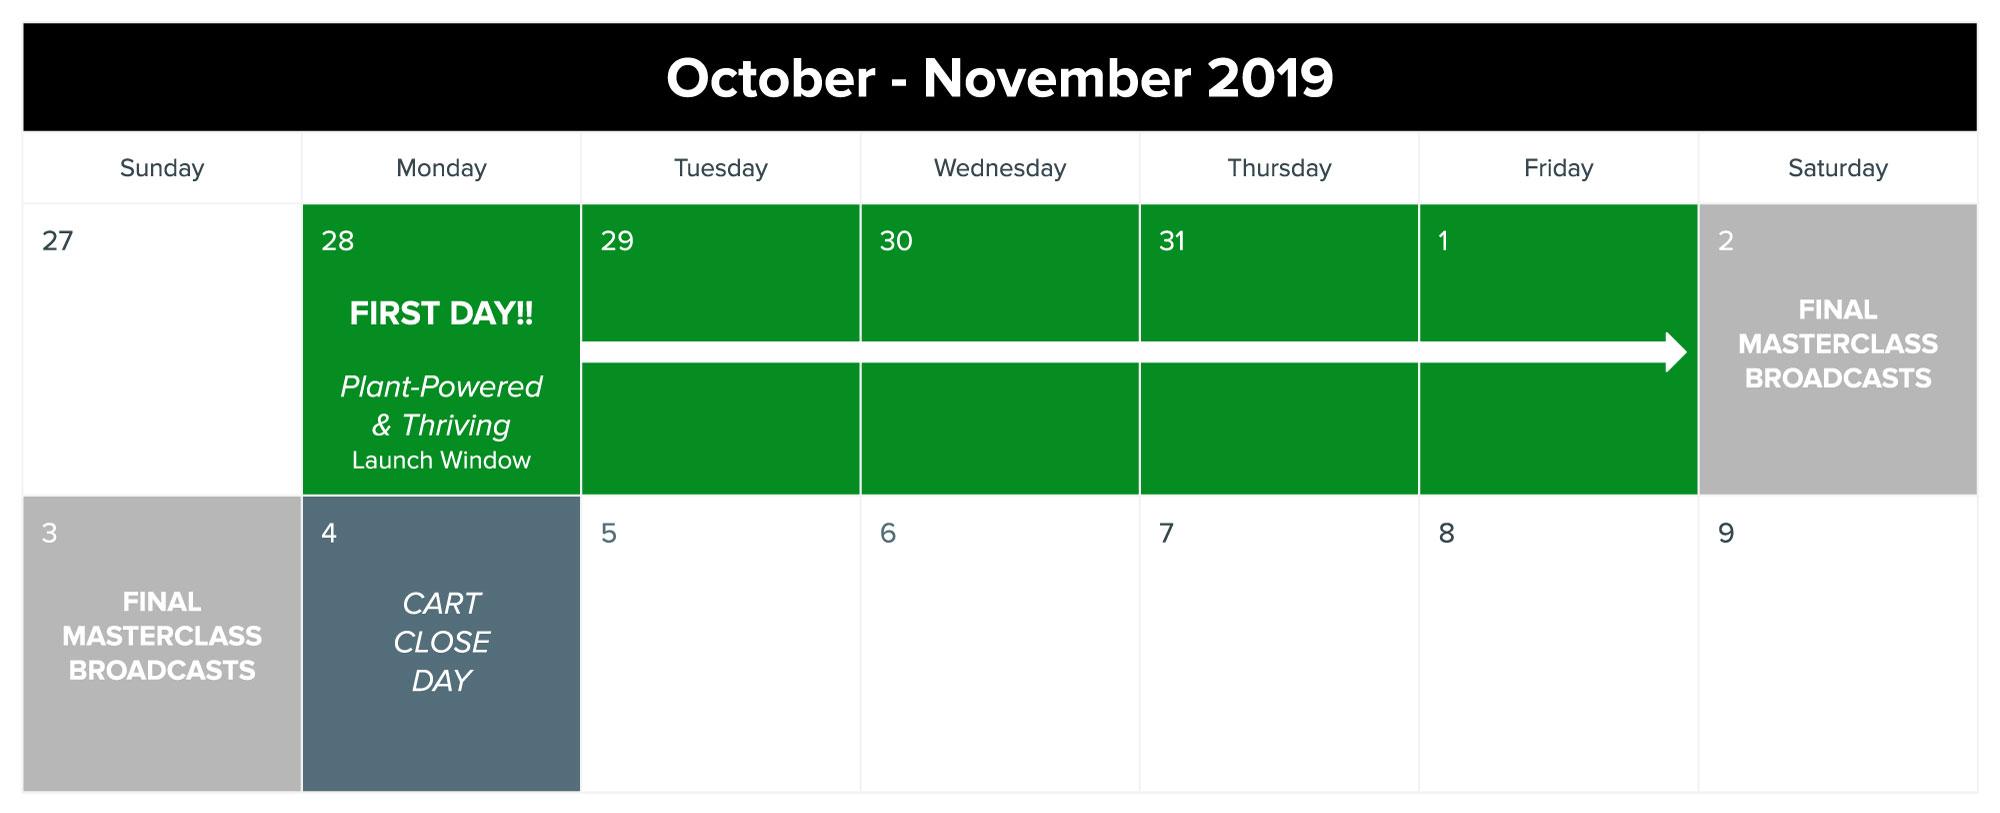 Plant-Powered & Thriving promo calendar